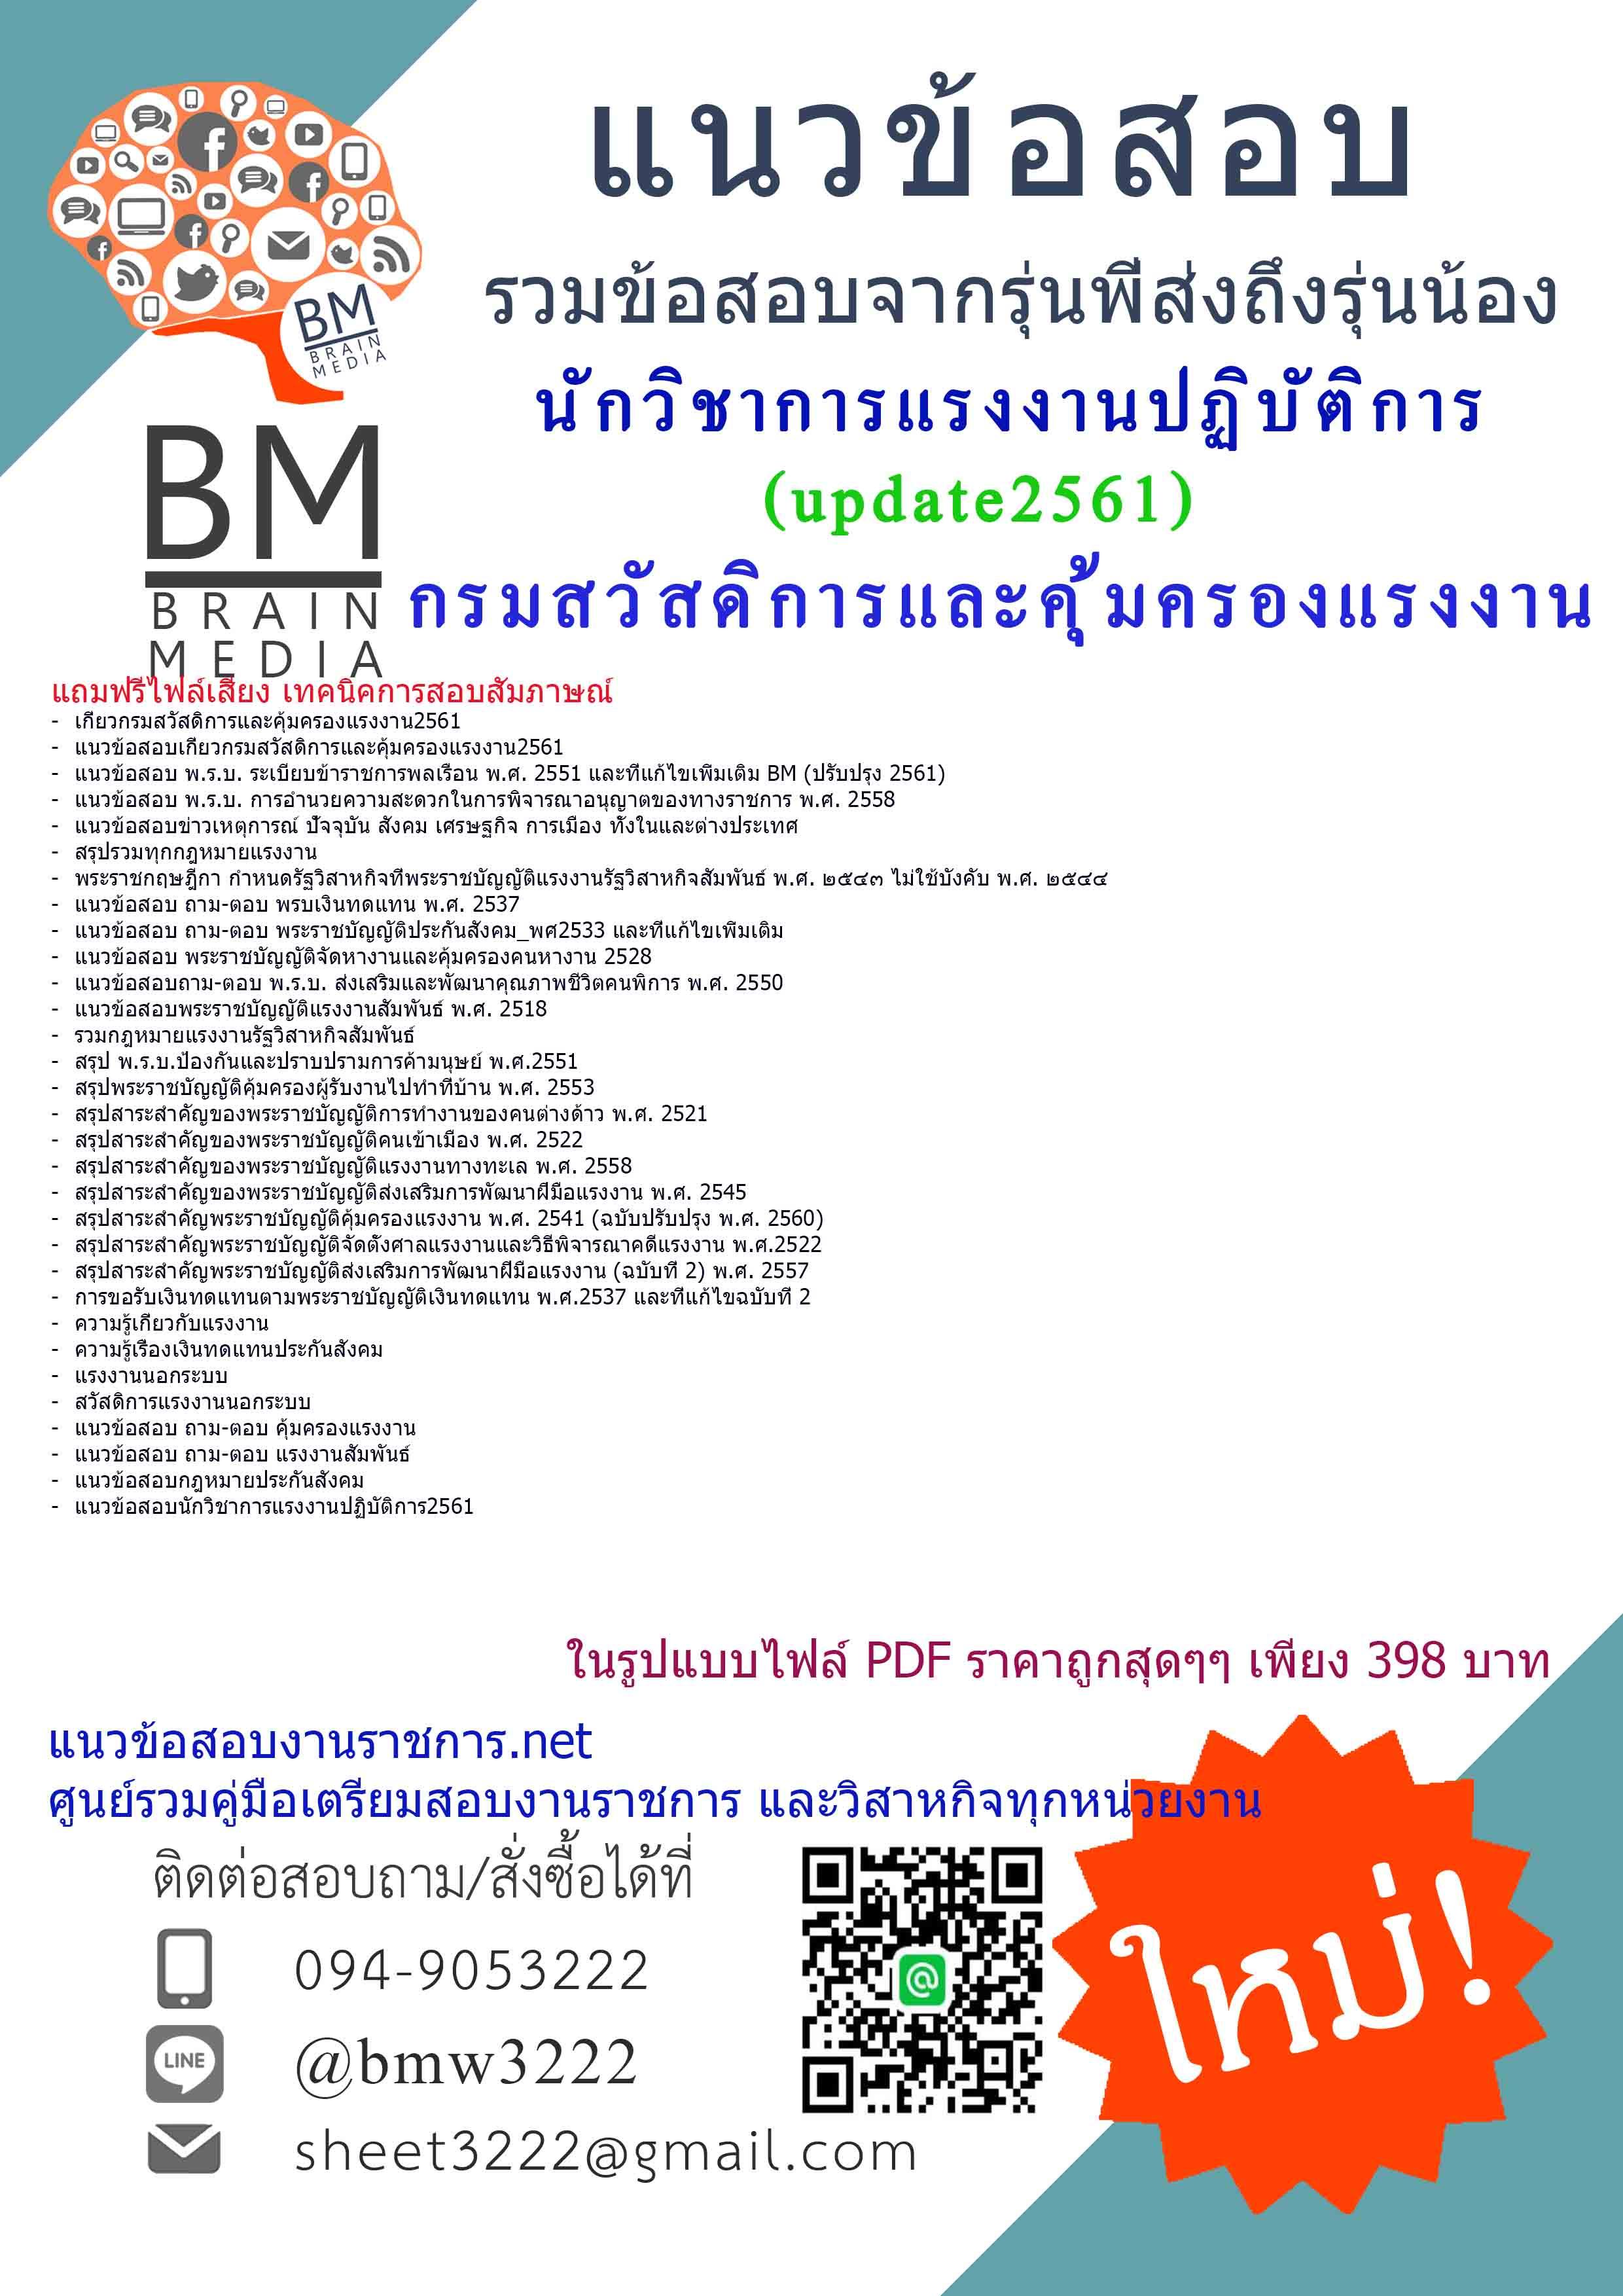 (((newupdateที่สุด)))แนวข้อสอบนักวิชาการแรงงานปฏิบัติการกรมสวัสดิการและคุ้มครองแรงงาน2561